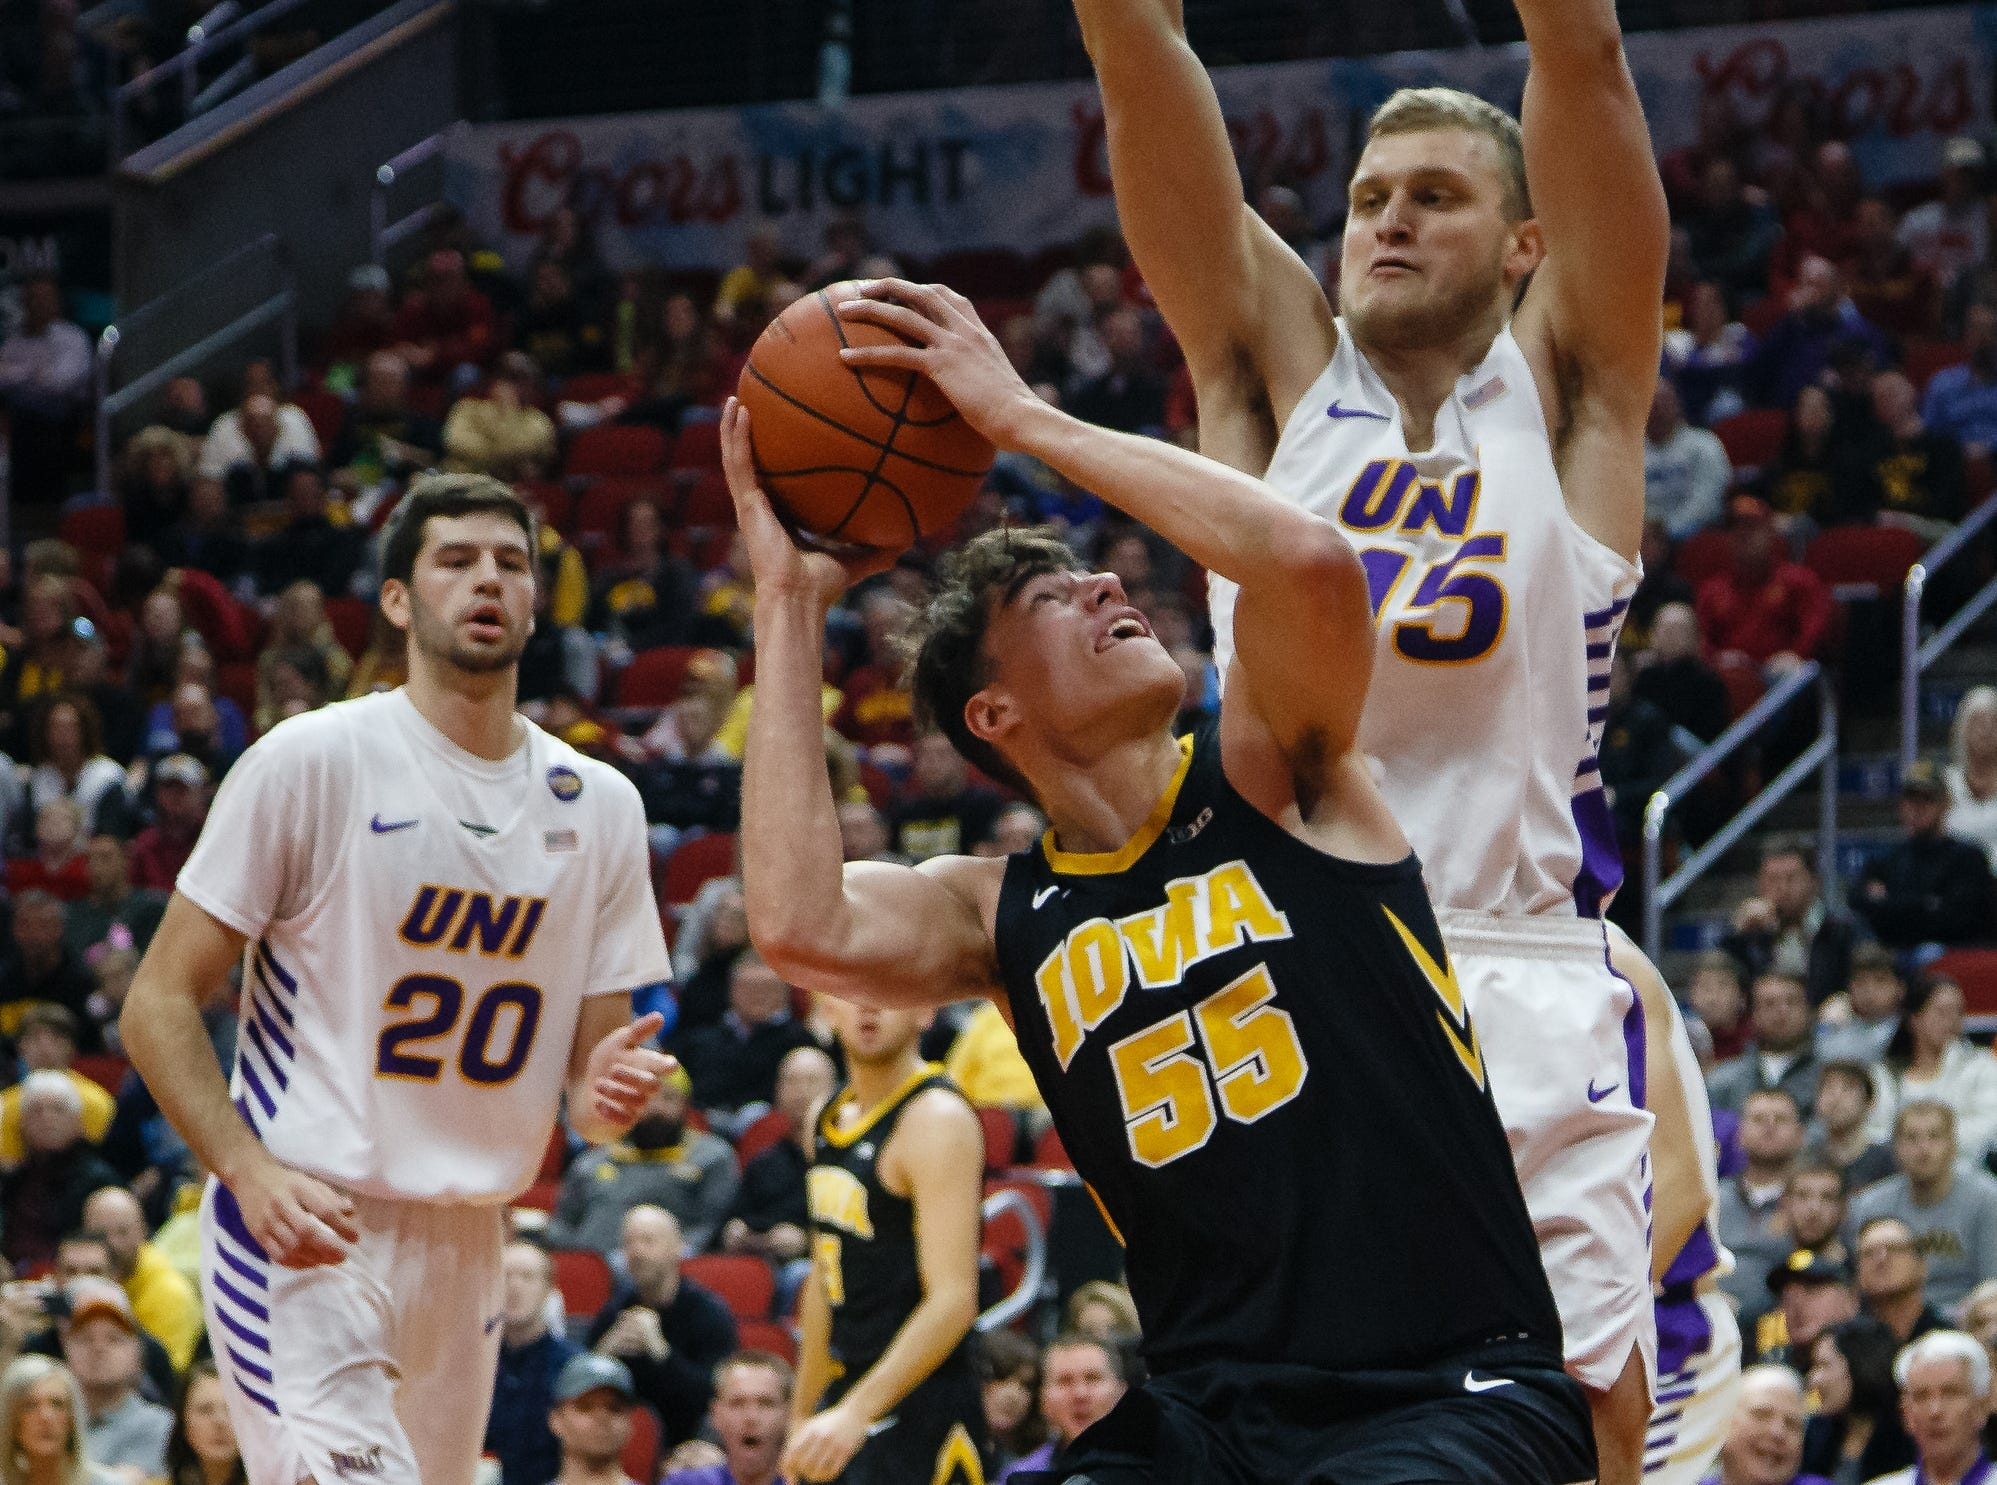 No. 21 Iowa Hawkeyes manhandle Northern Iowa in Hy-Vee Classic farewell